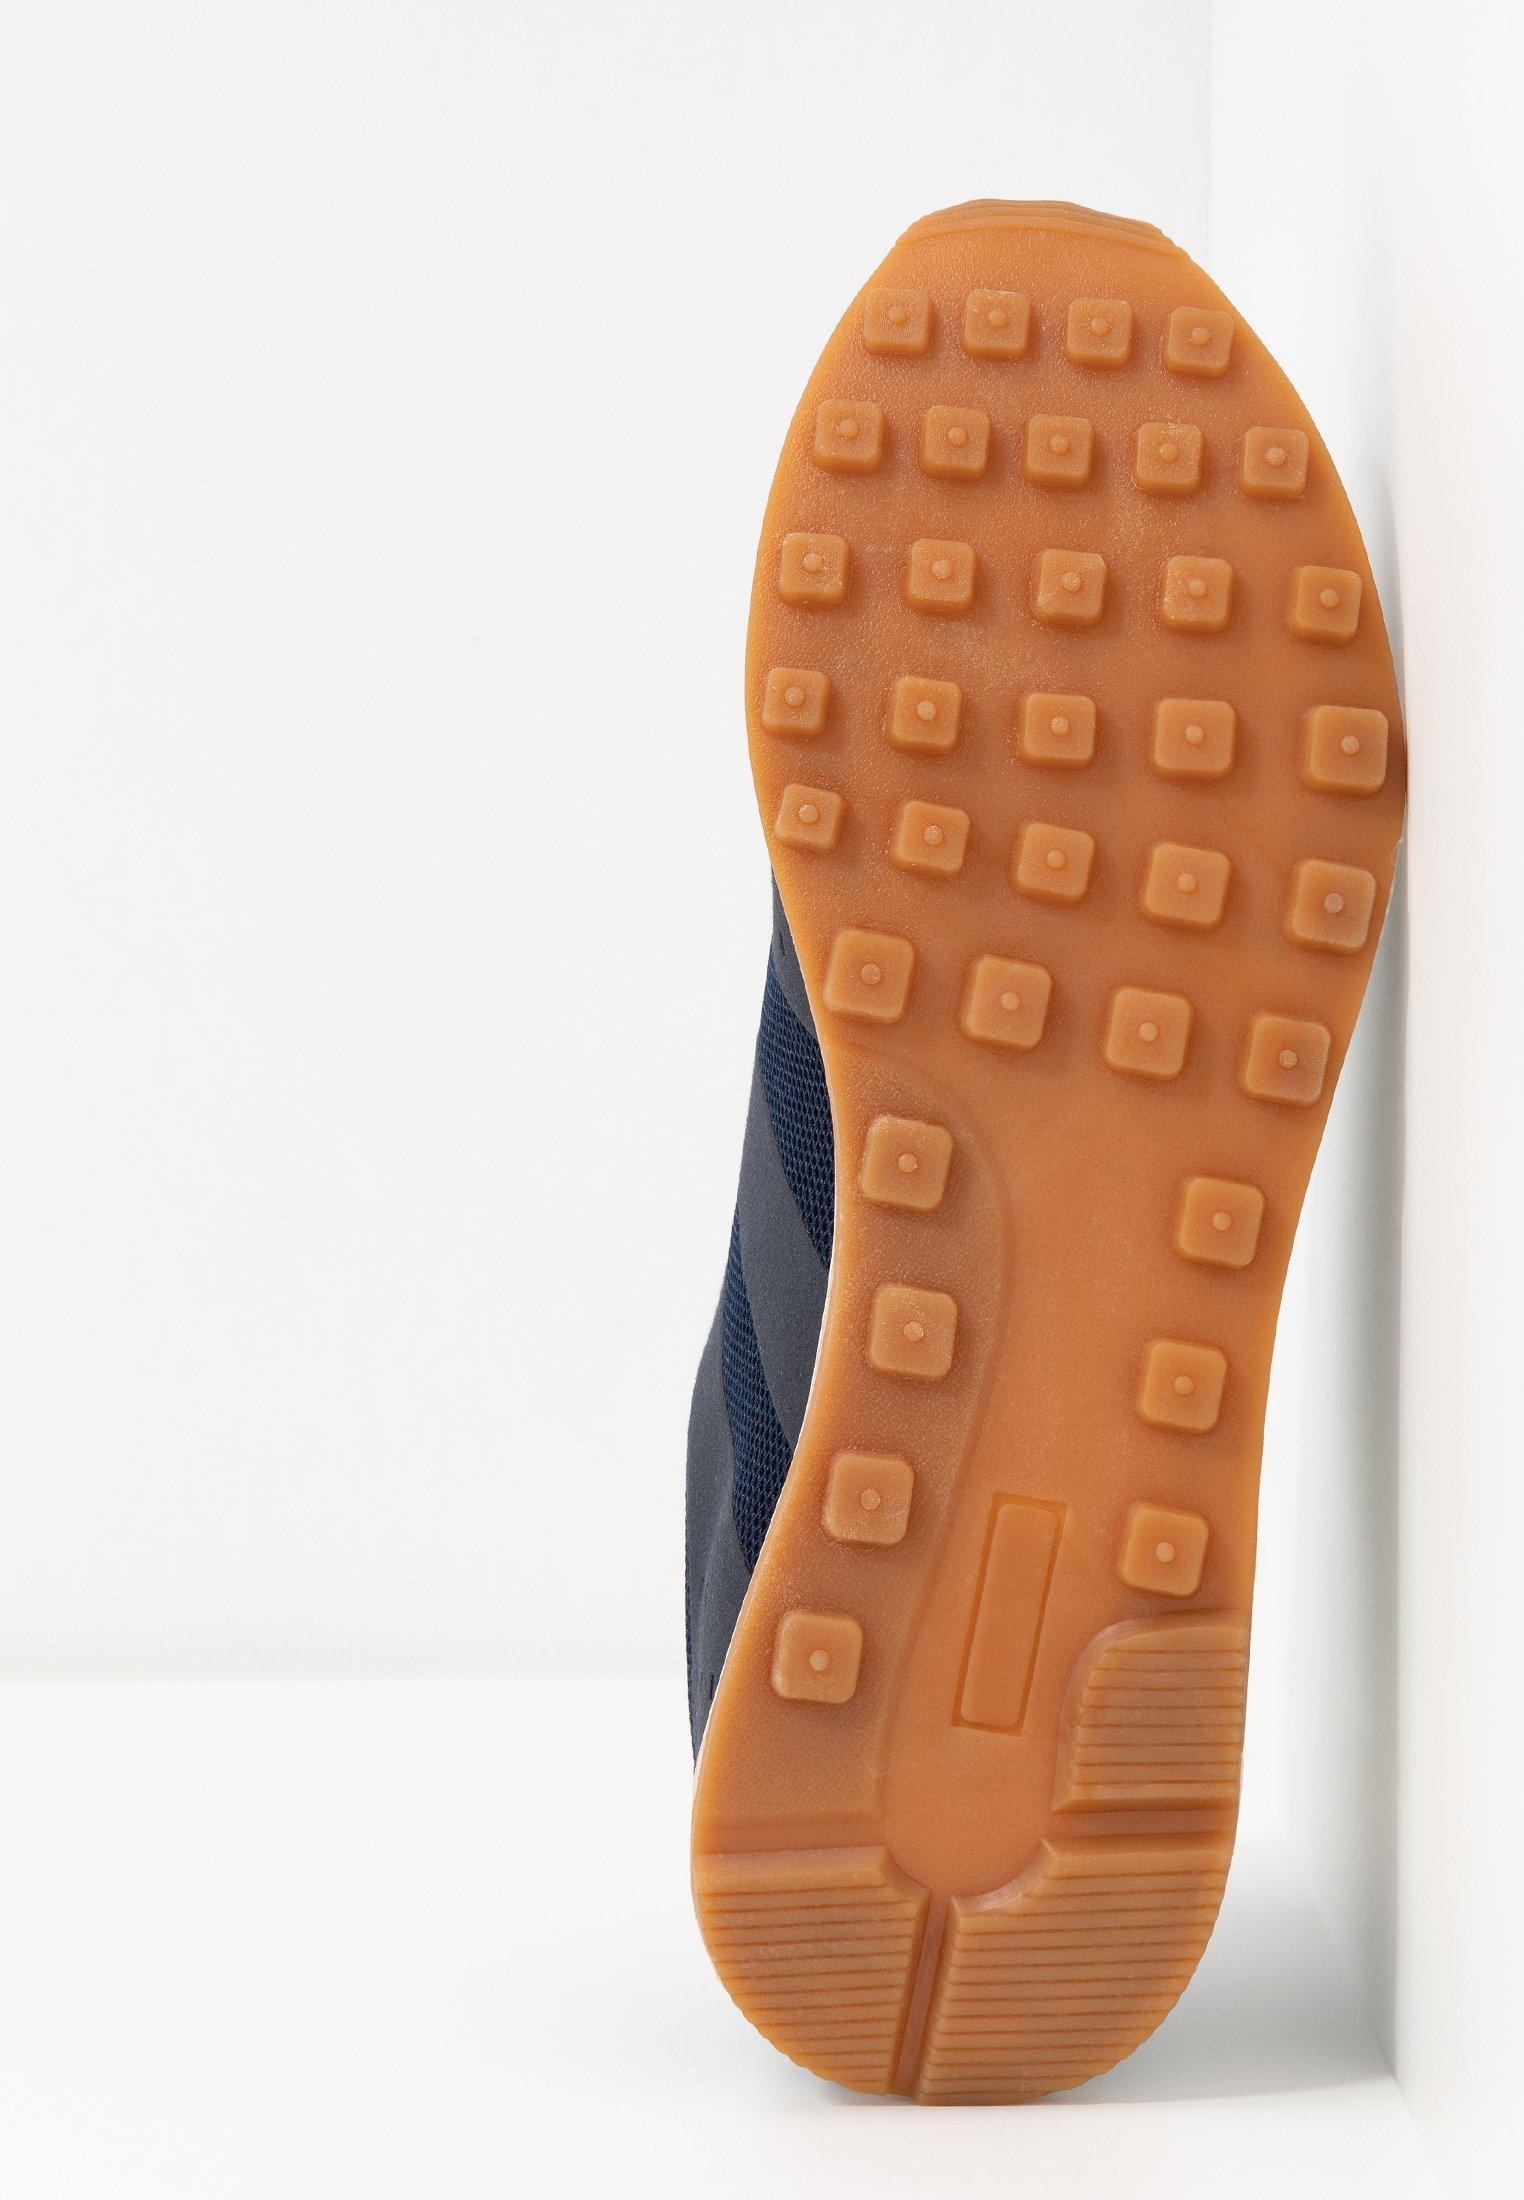 Geringster Preis Pier One Sneaker low - dark blue | Damenbekleidung 2020